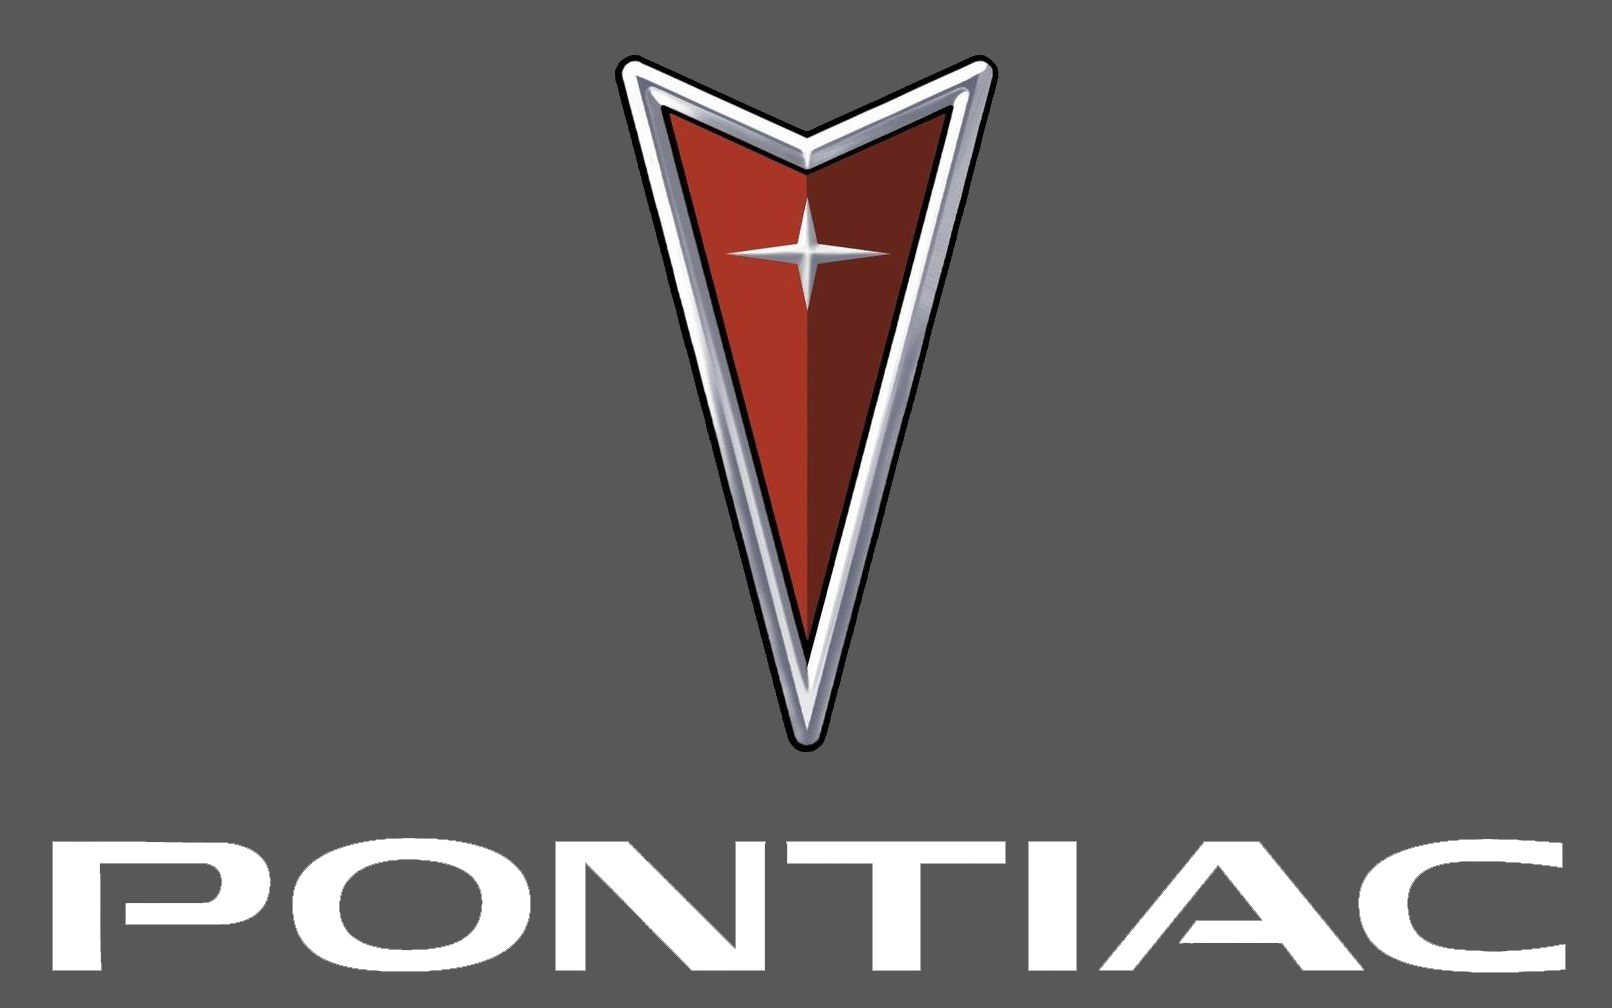 Will Gm Ever Bring Back The Pontiac Brand 0 60 Specs